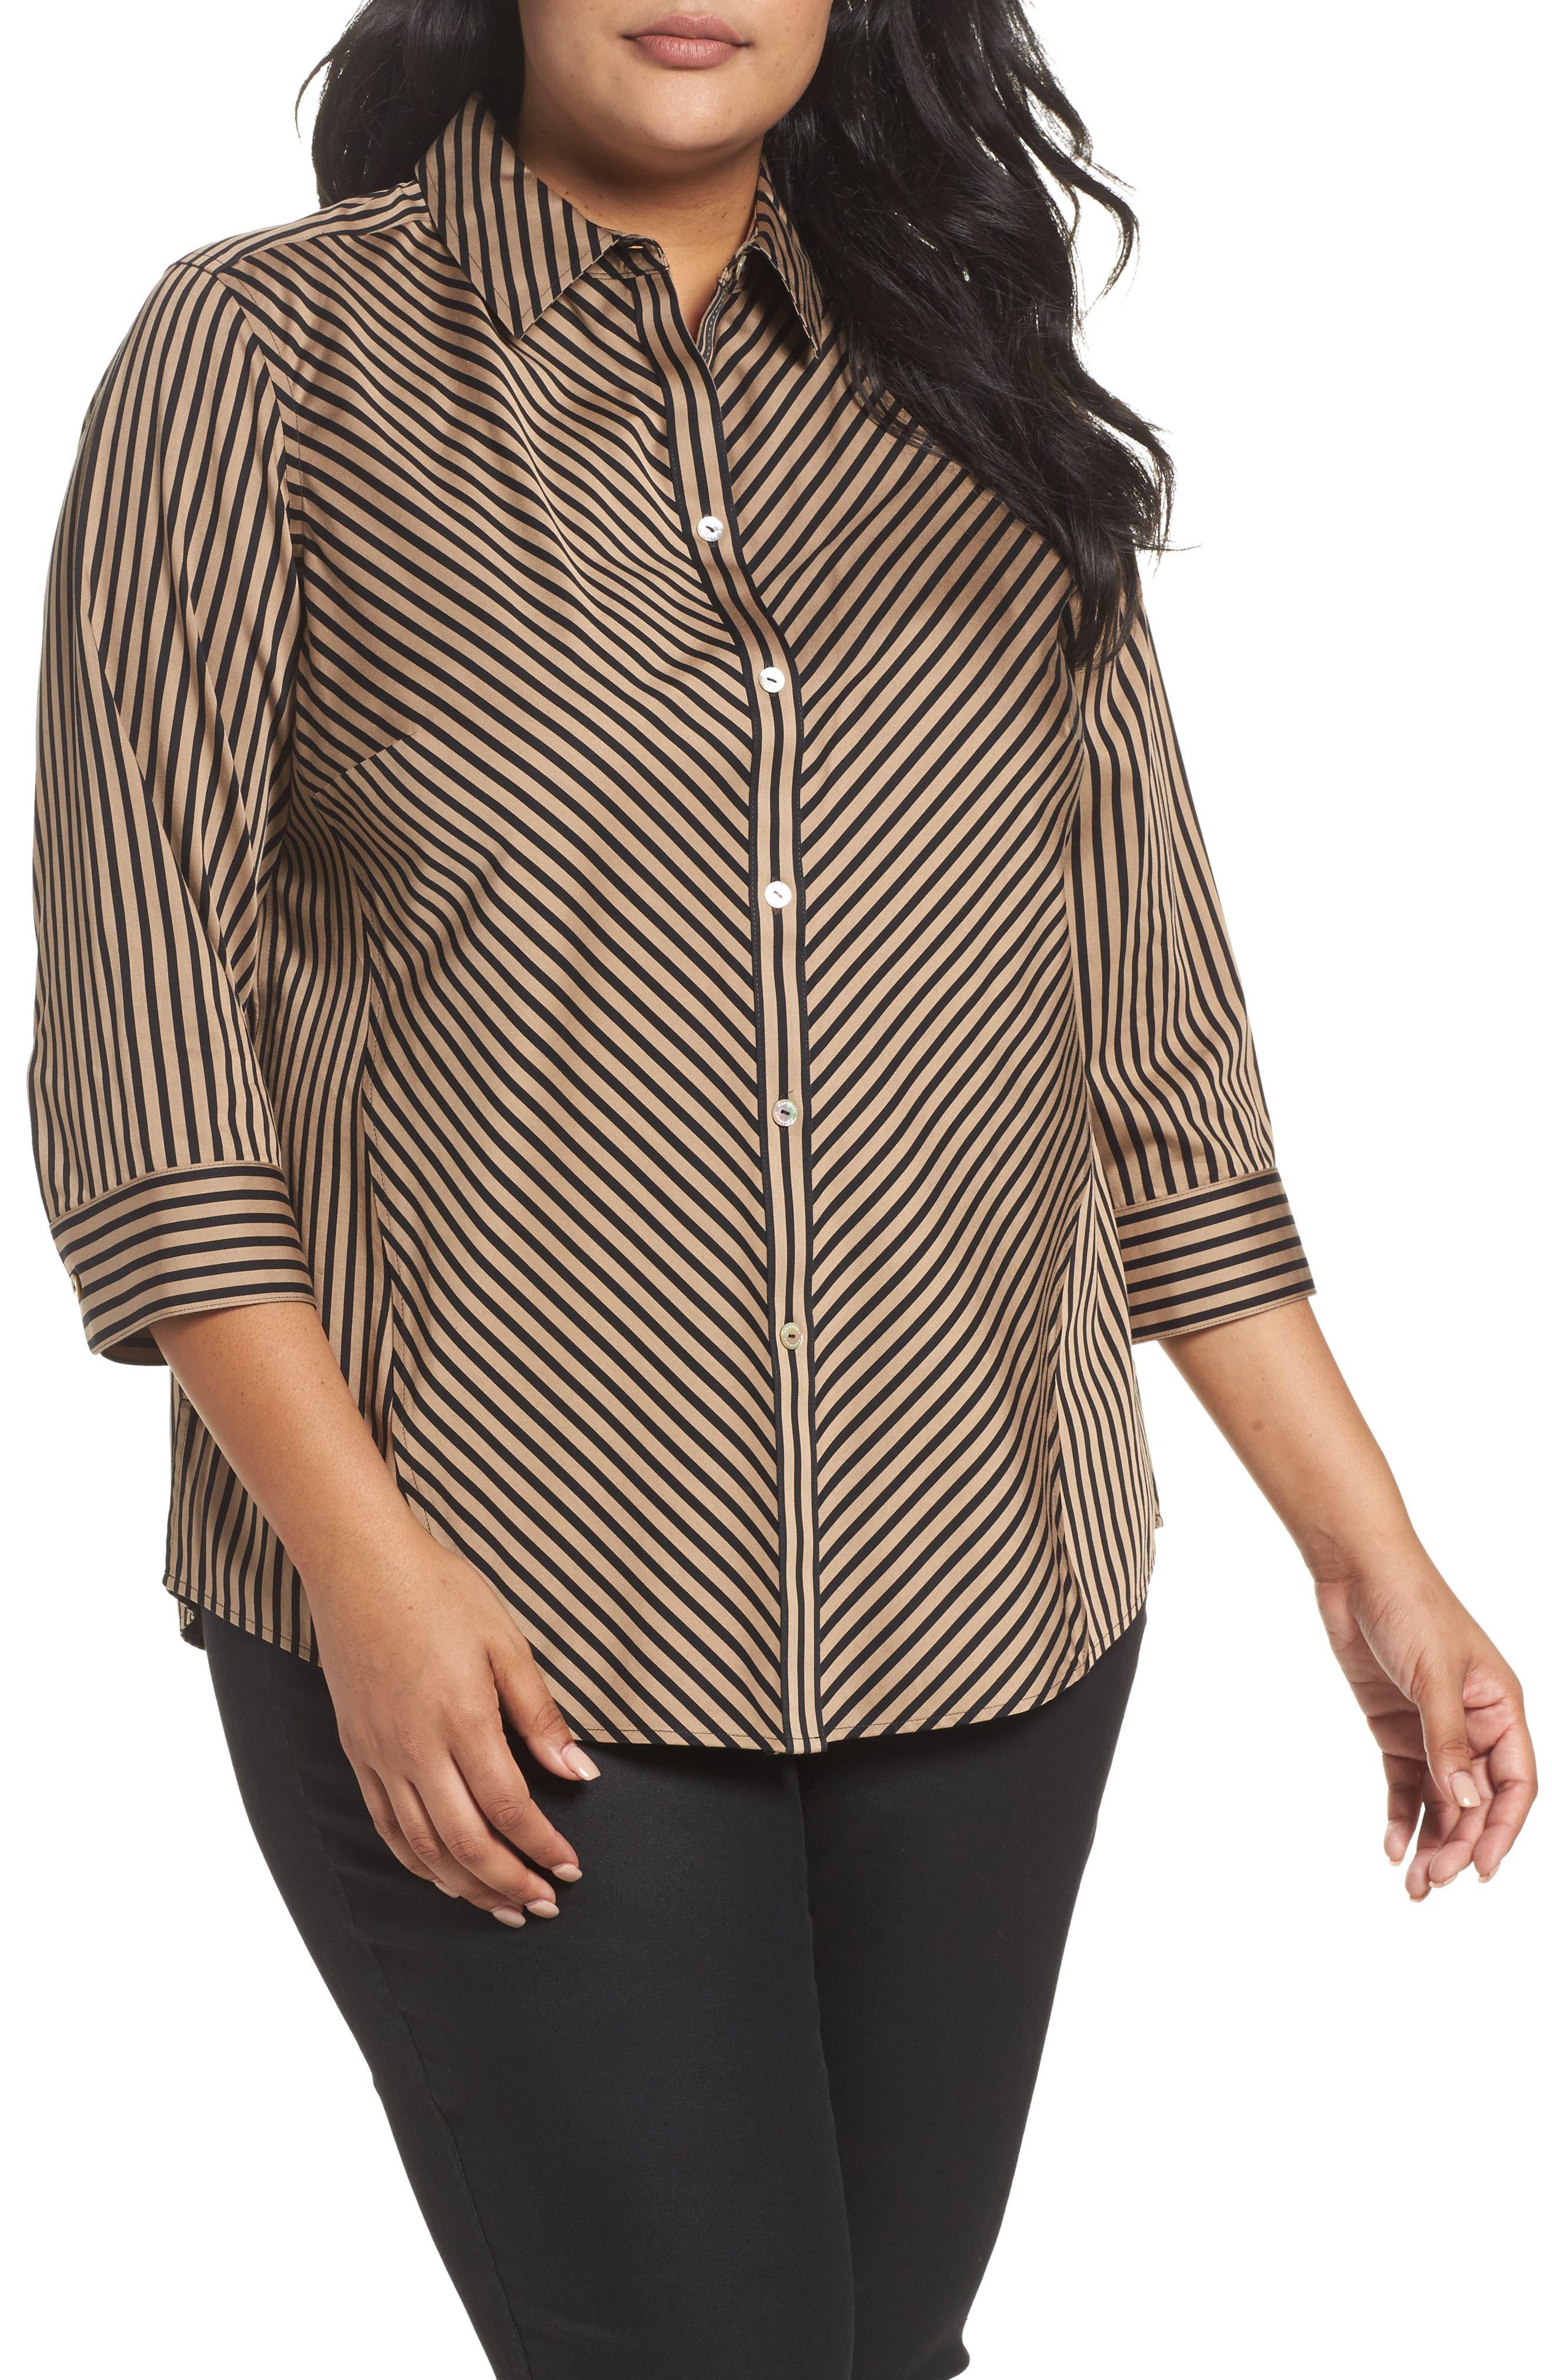 Alternate Image 1 Selected - Foxcroft Fallon Satin Stripe Cotton Shirt (Plus Size)